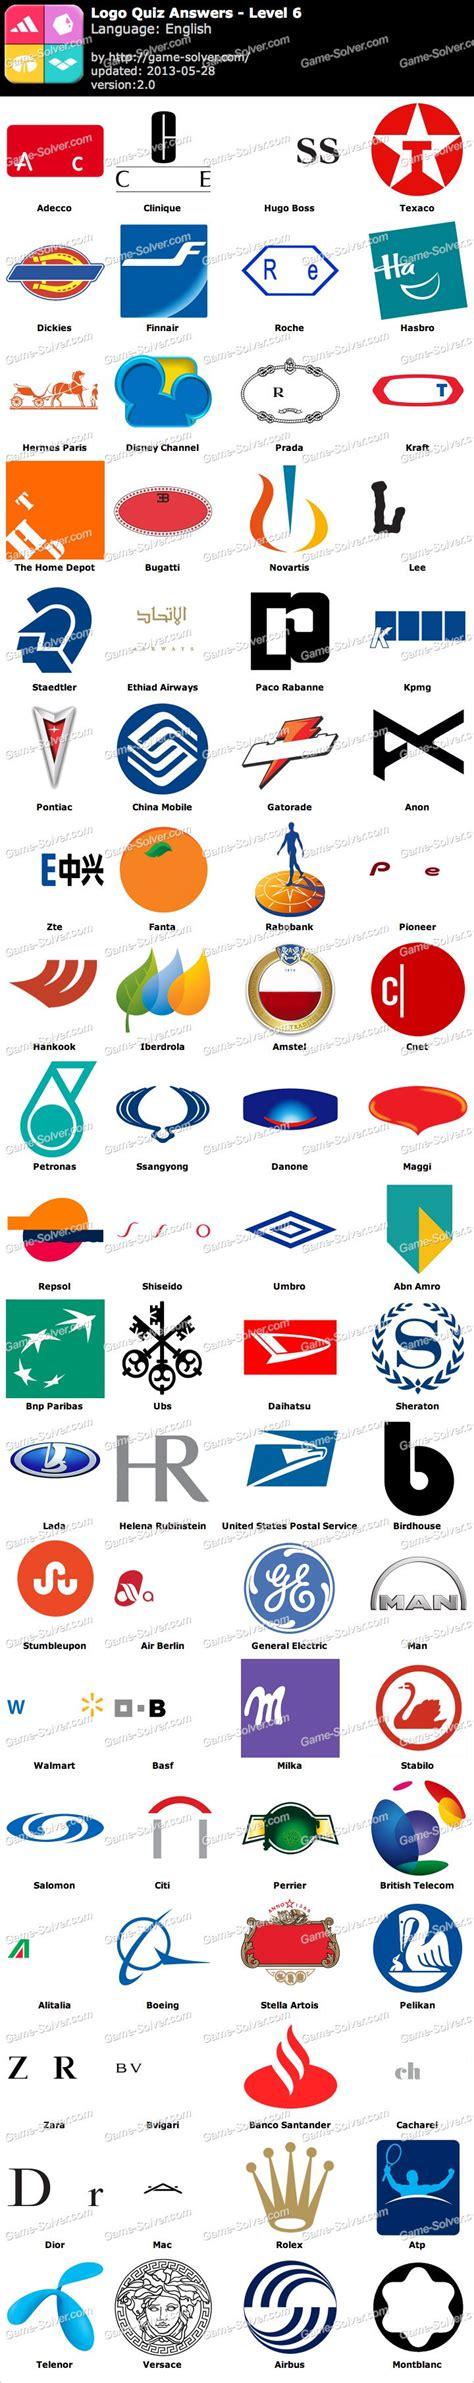 logo quiz level 6 by logo quiz level 6 solver